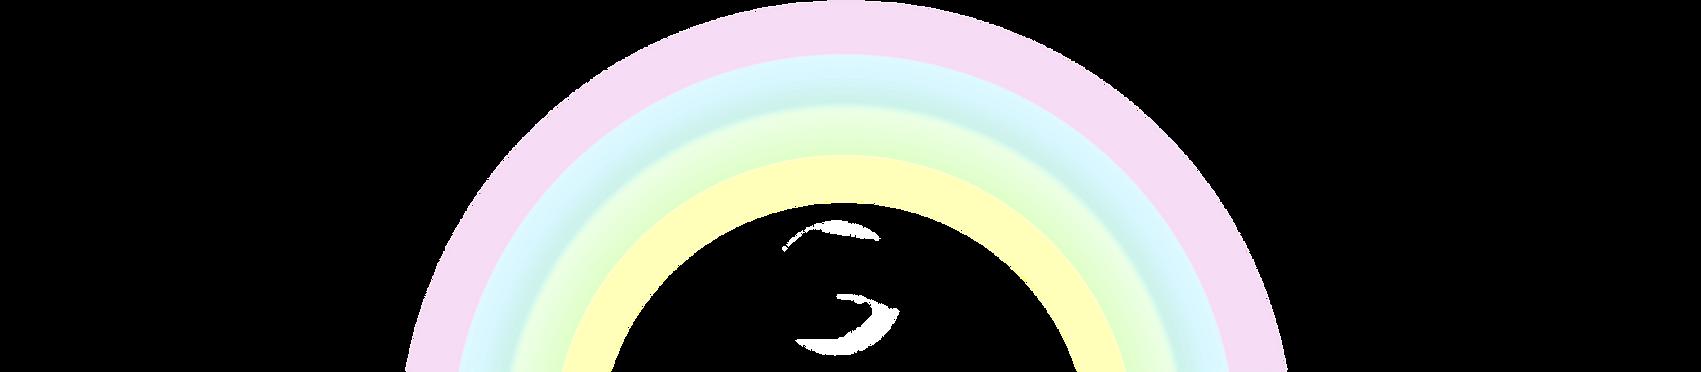 DELCO-CPS-rainbow-art-3_edited_edited.pn